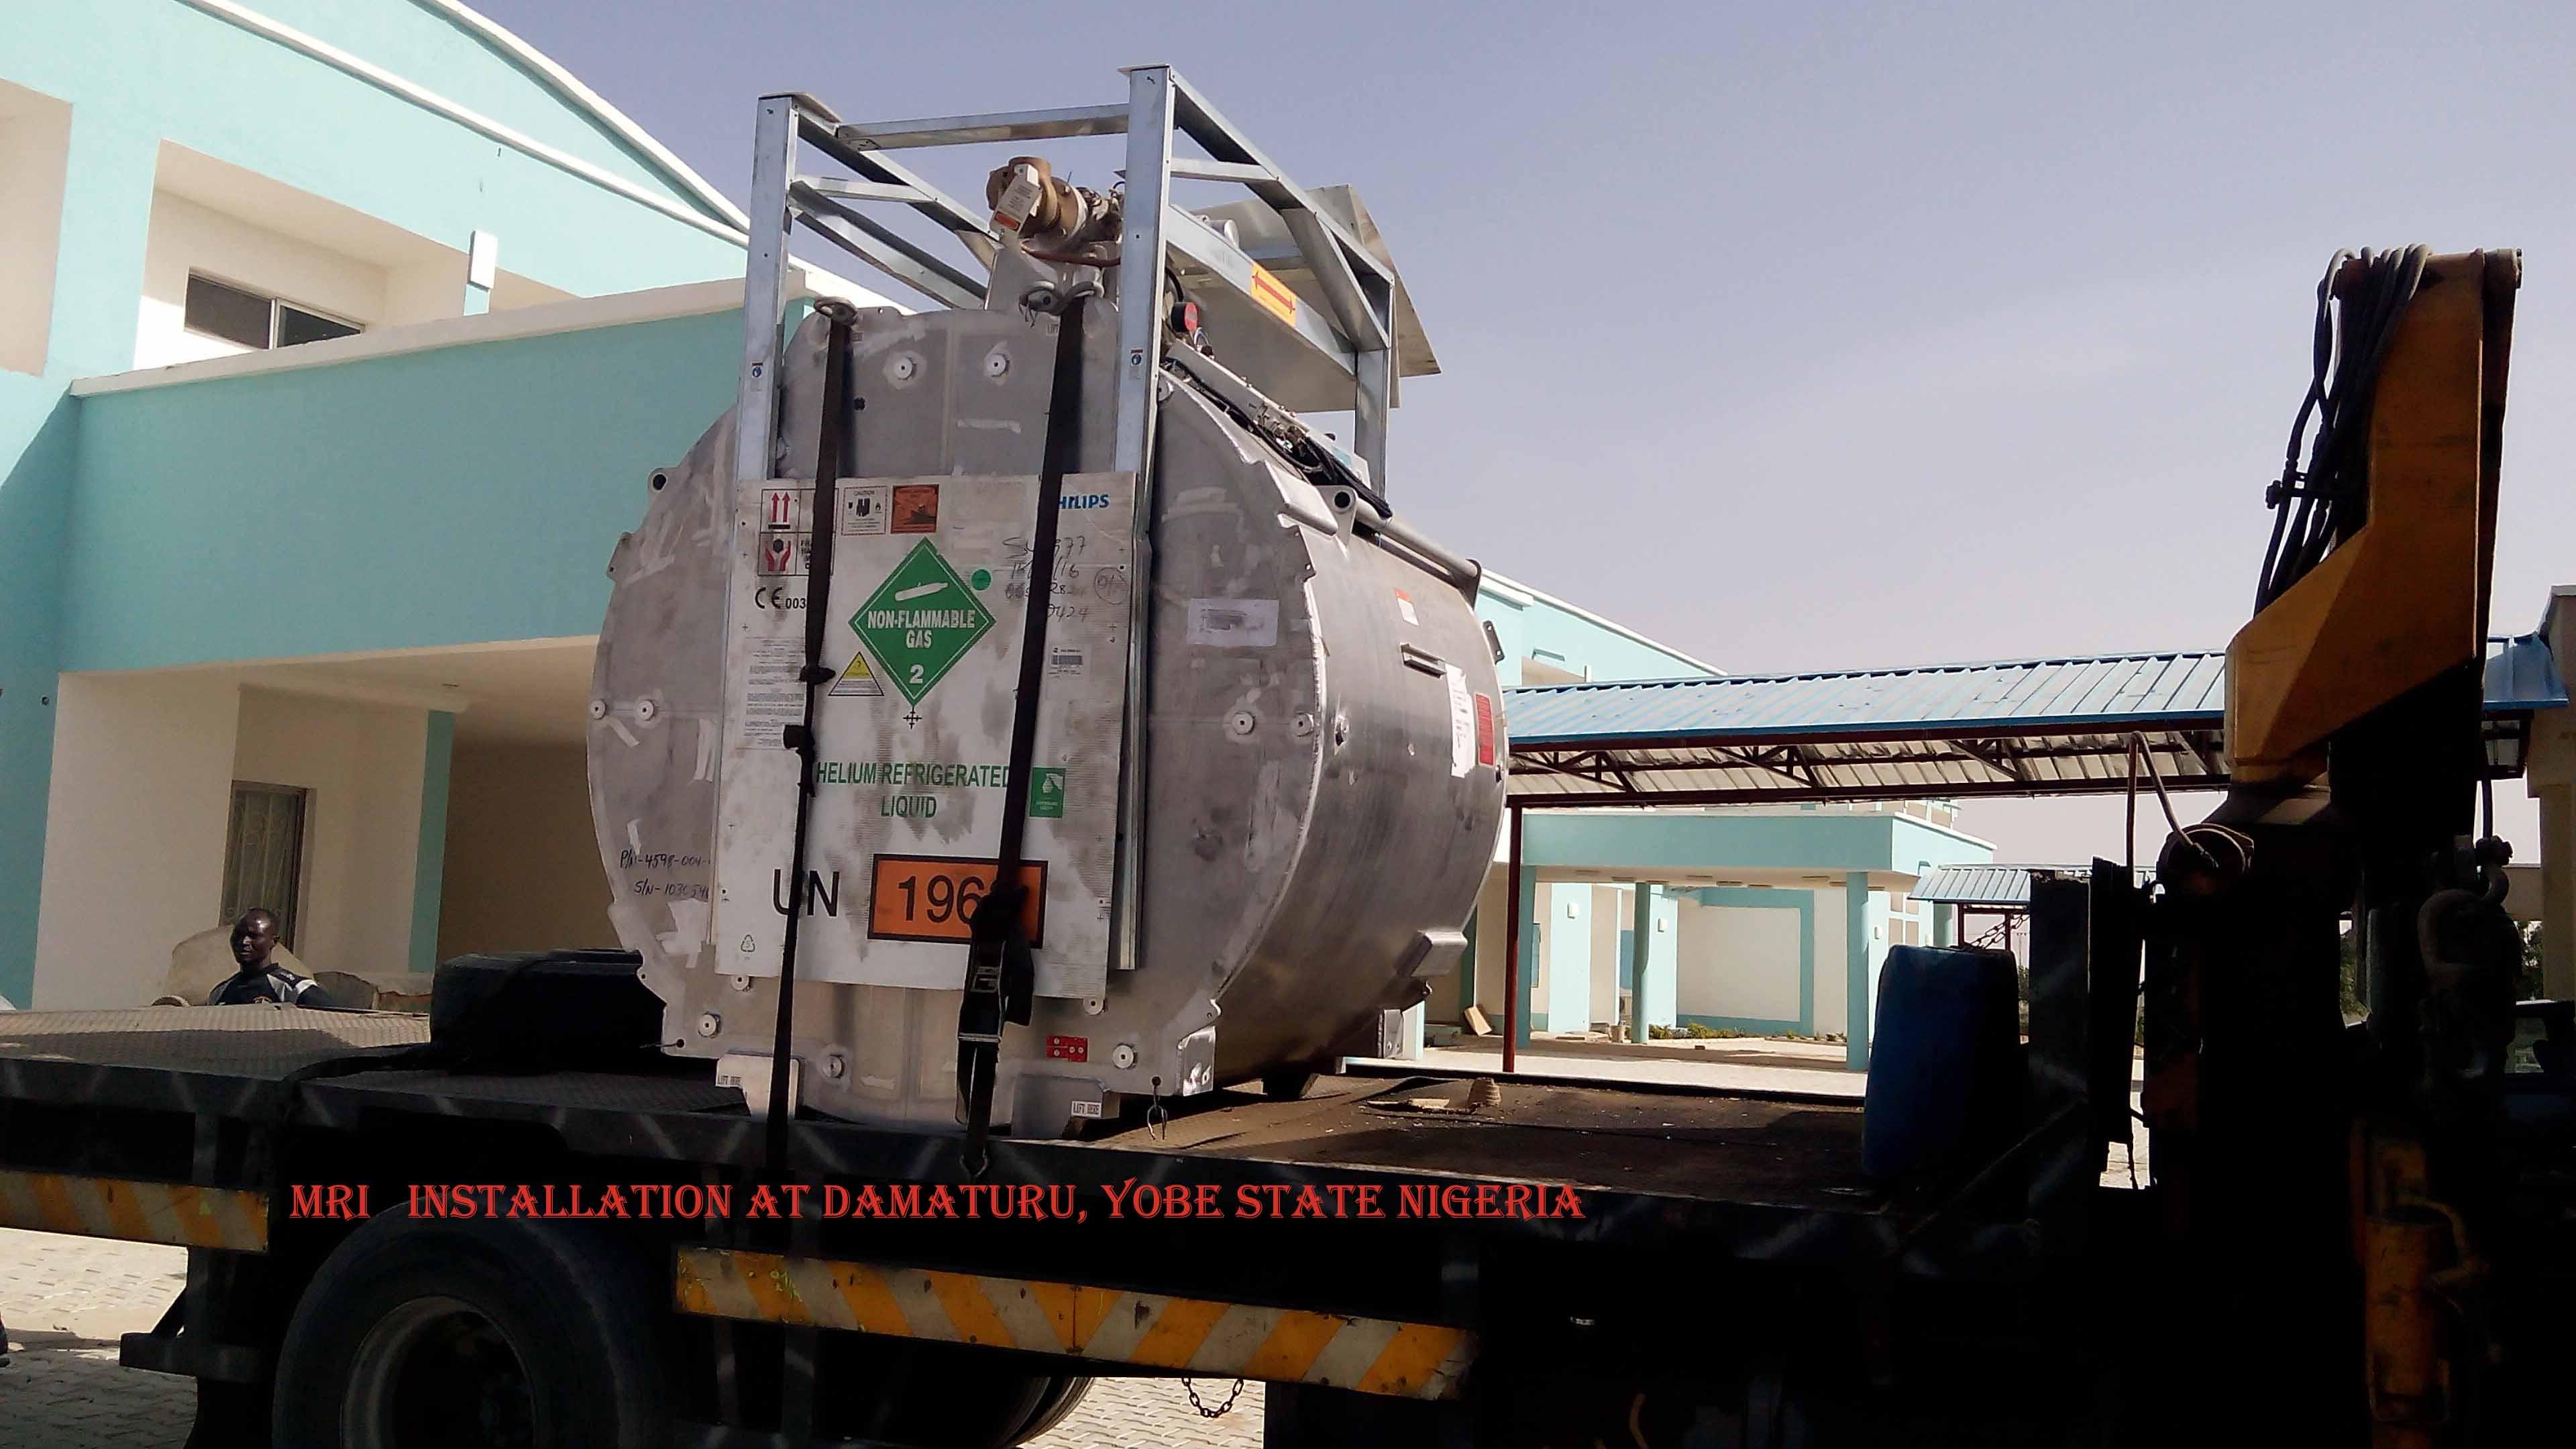 Complete Installation of MRI 1 5T Carl Novel@Damaturu, Yobe State